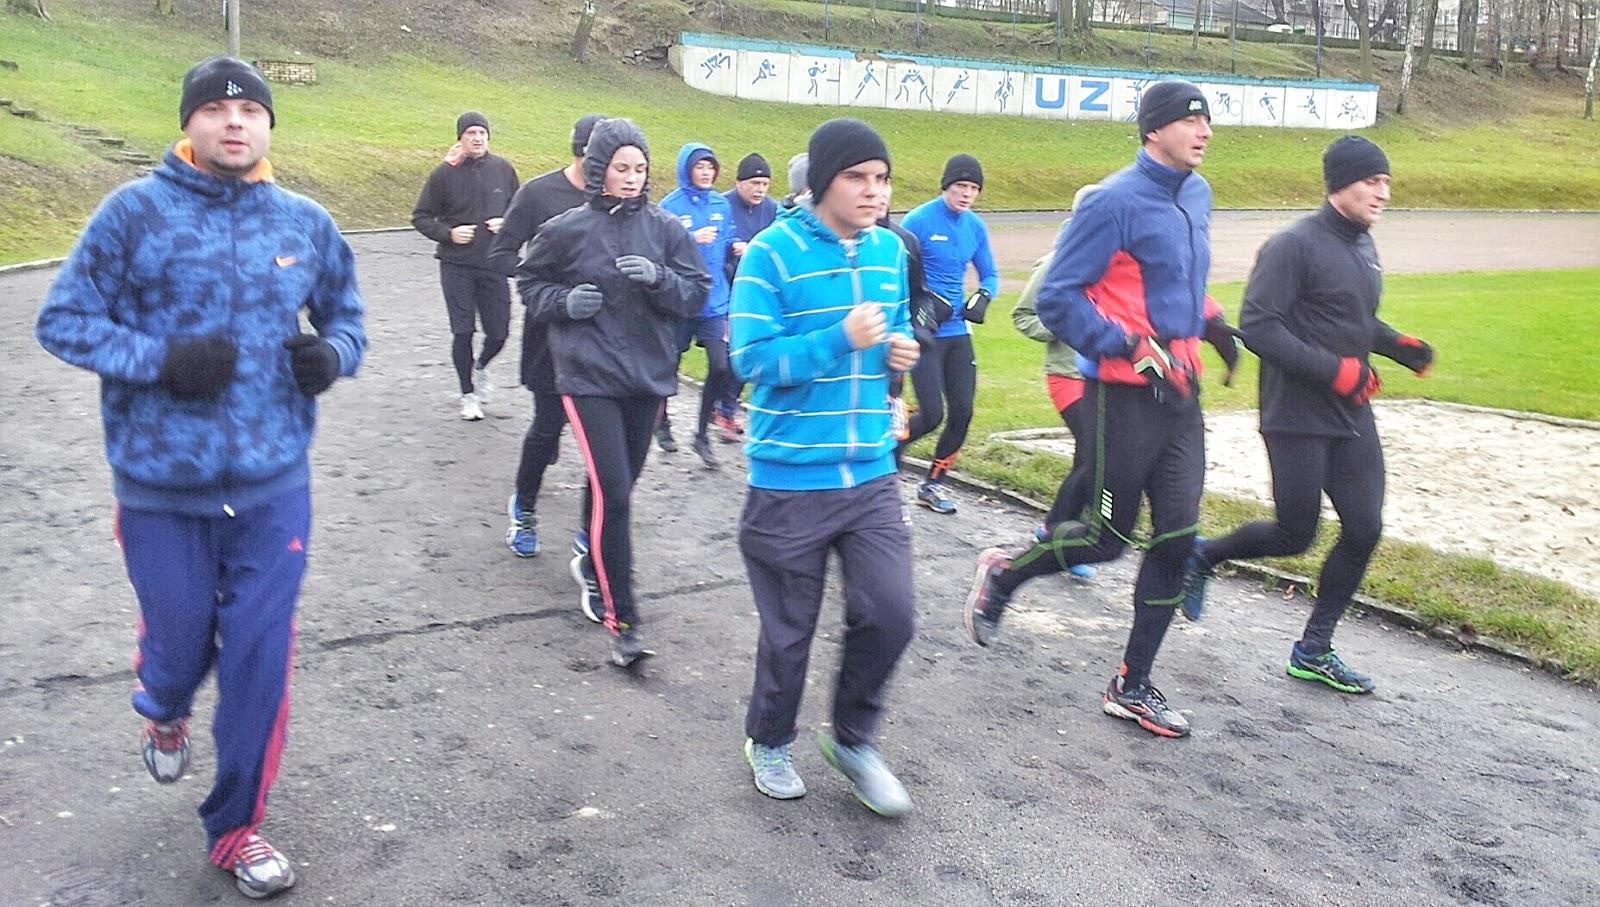 trening, bieg, Zielona Góra, sport